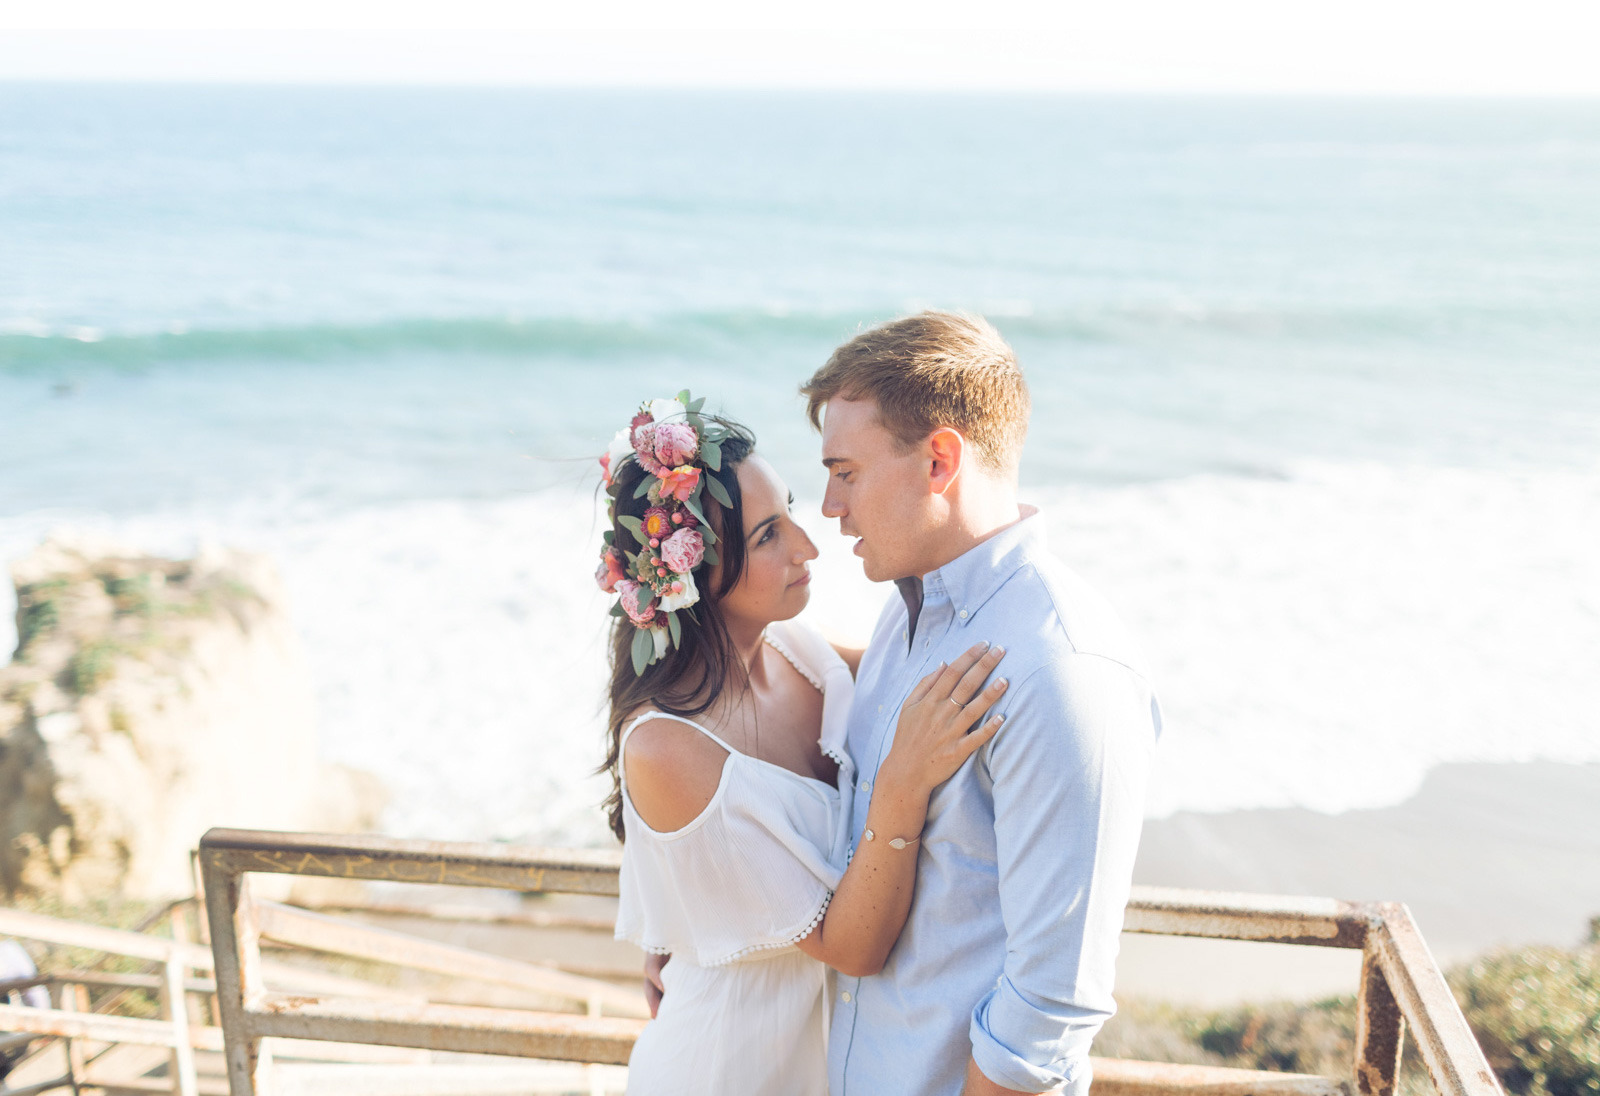 San-Luis-Obispo-Wedding-Photographer-Natalie-Schutt-Photography_12.jpg